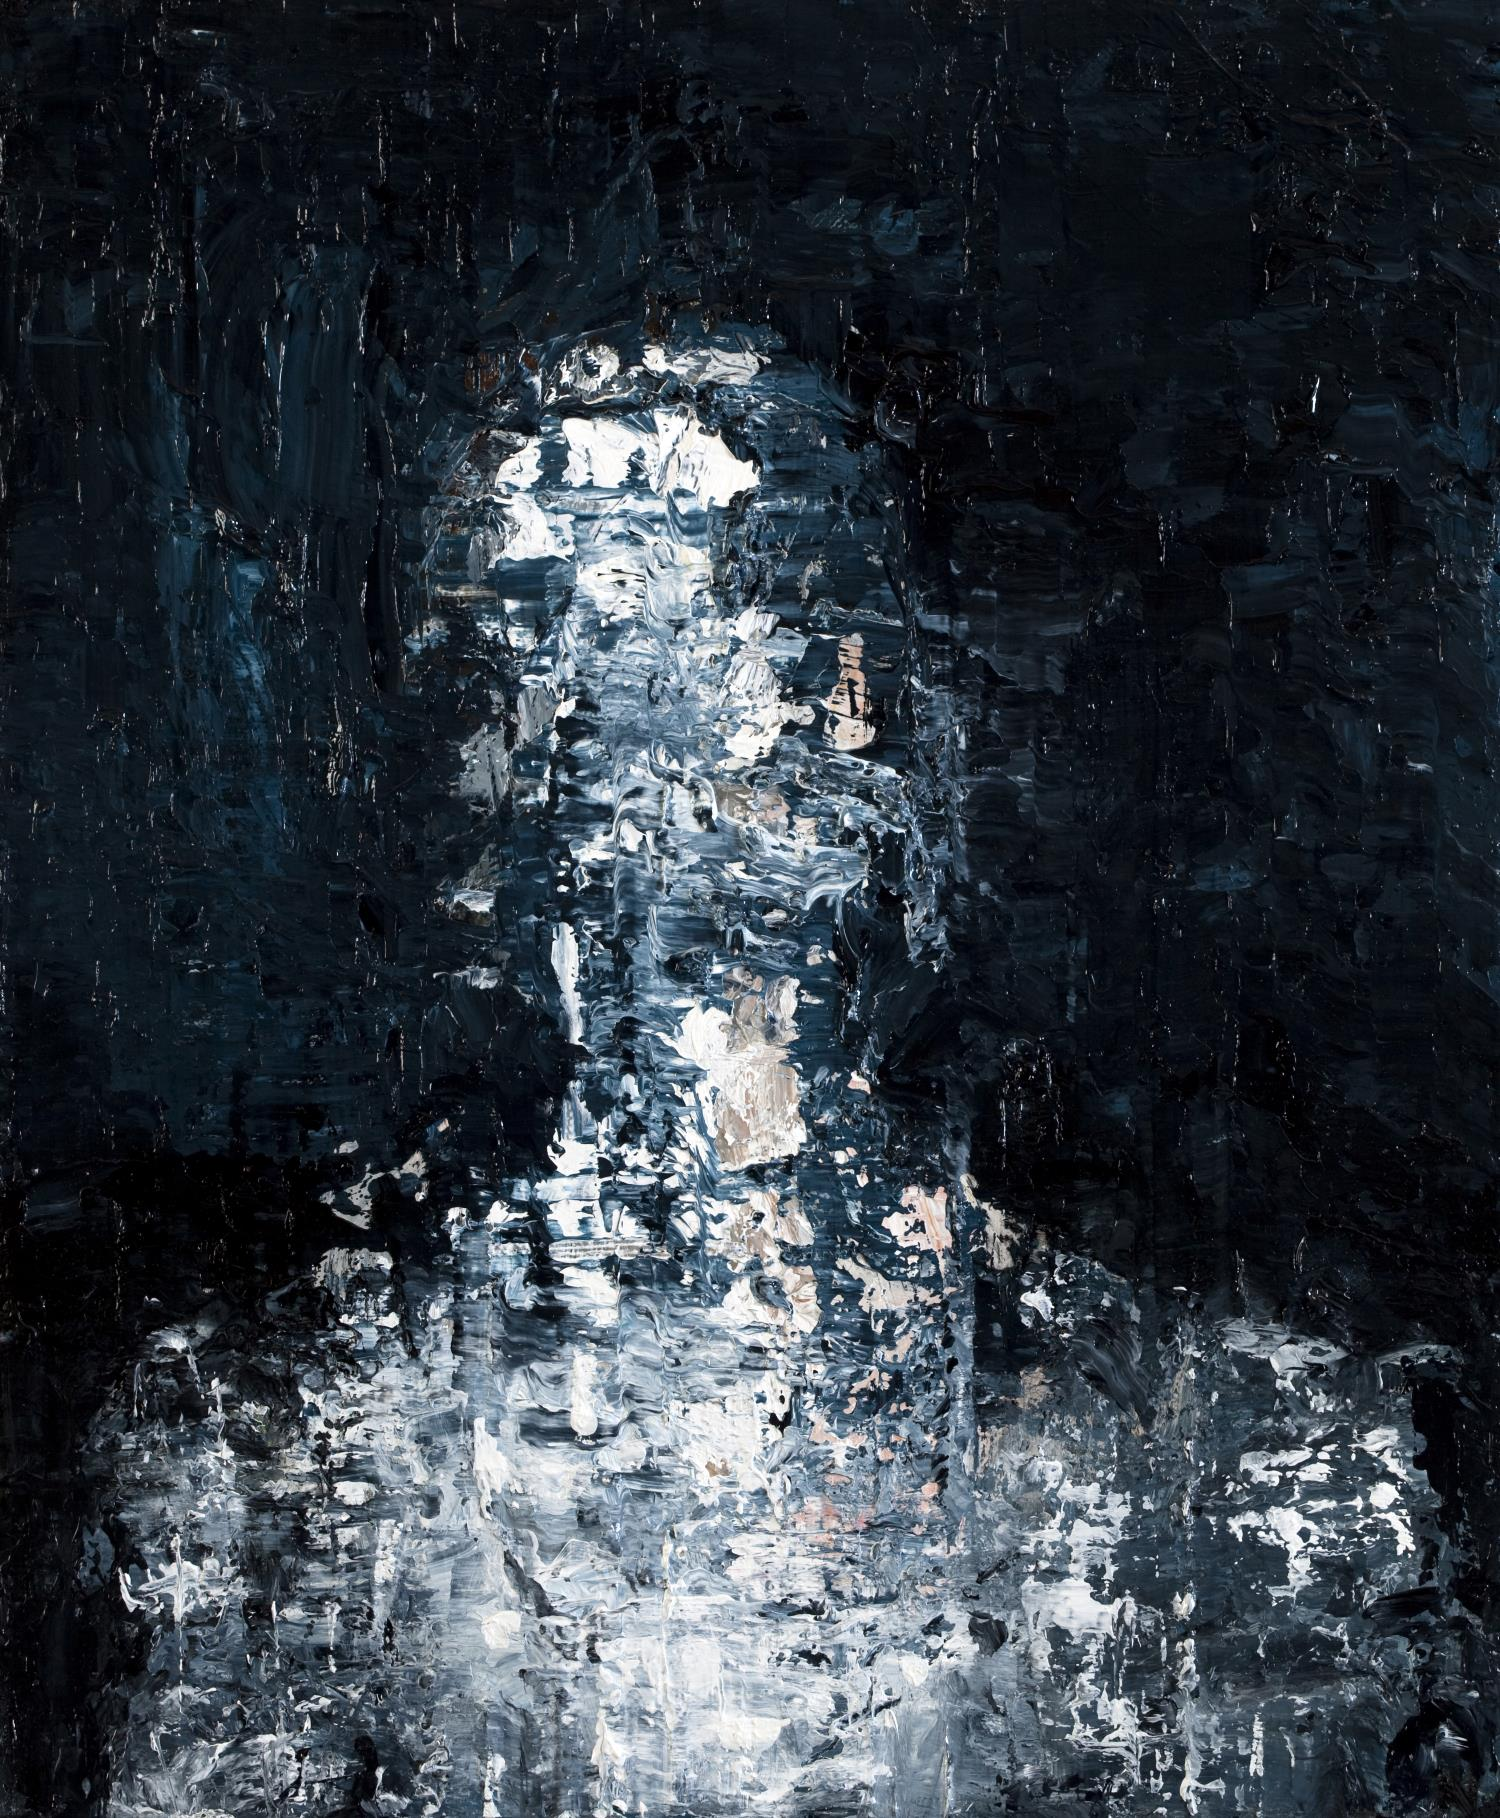 Replica 30x25cm Oil on Canvas 2014S.Lawlor.jpg